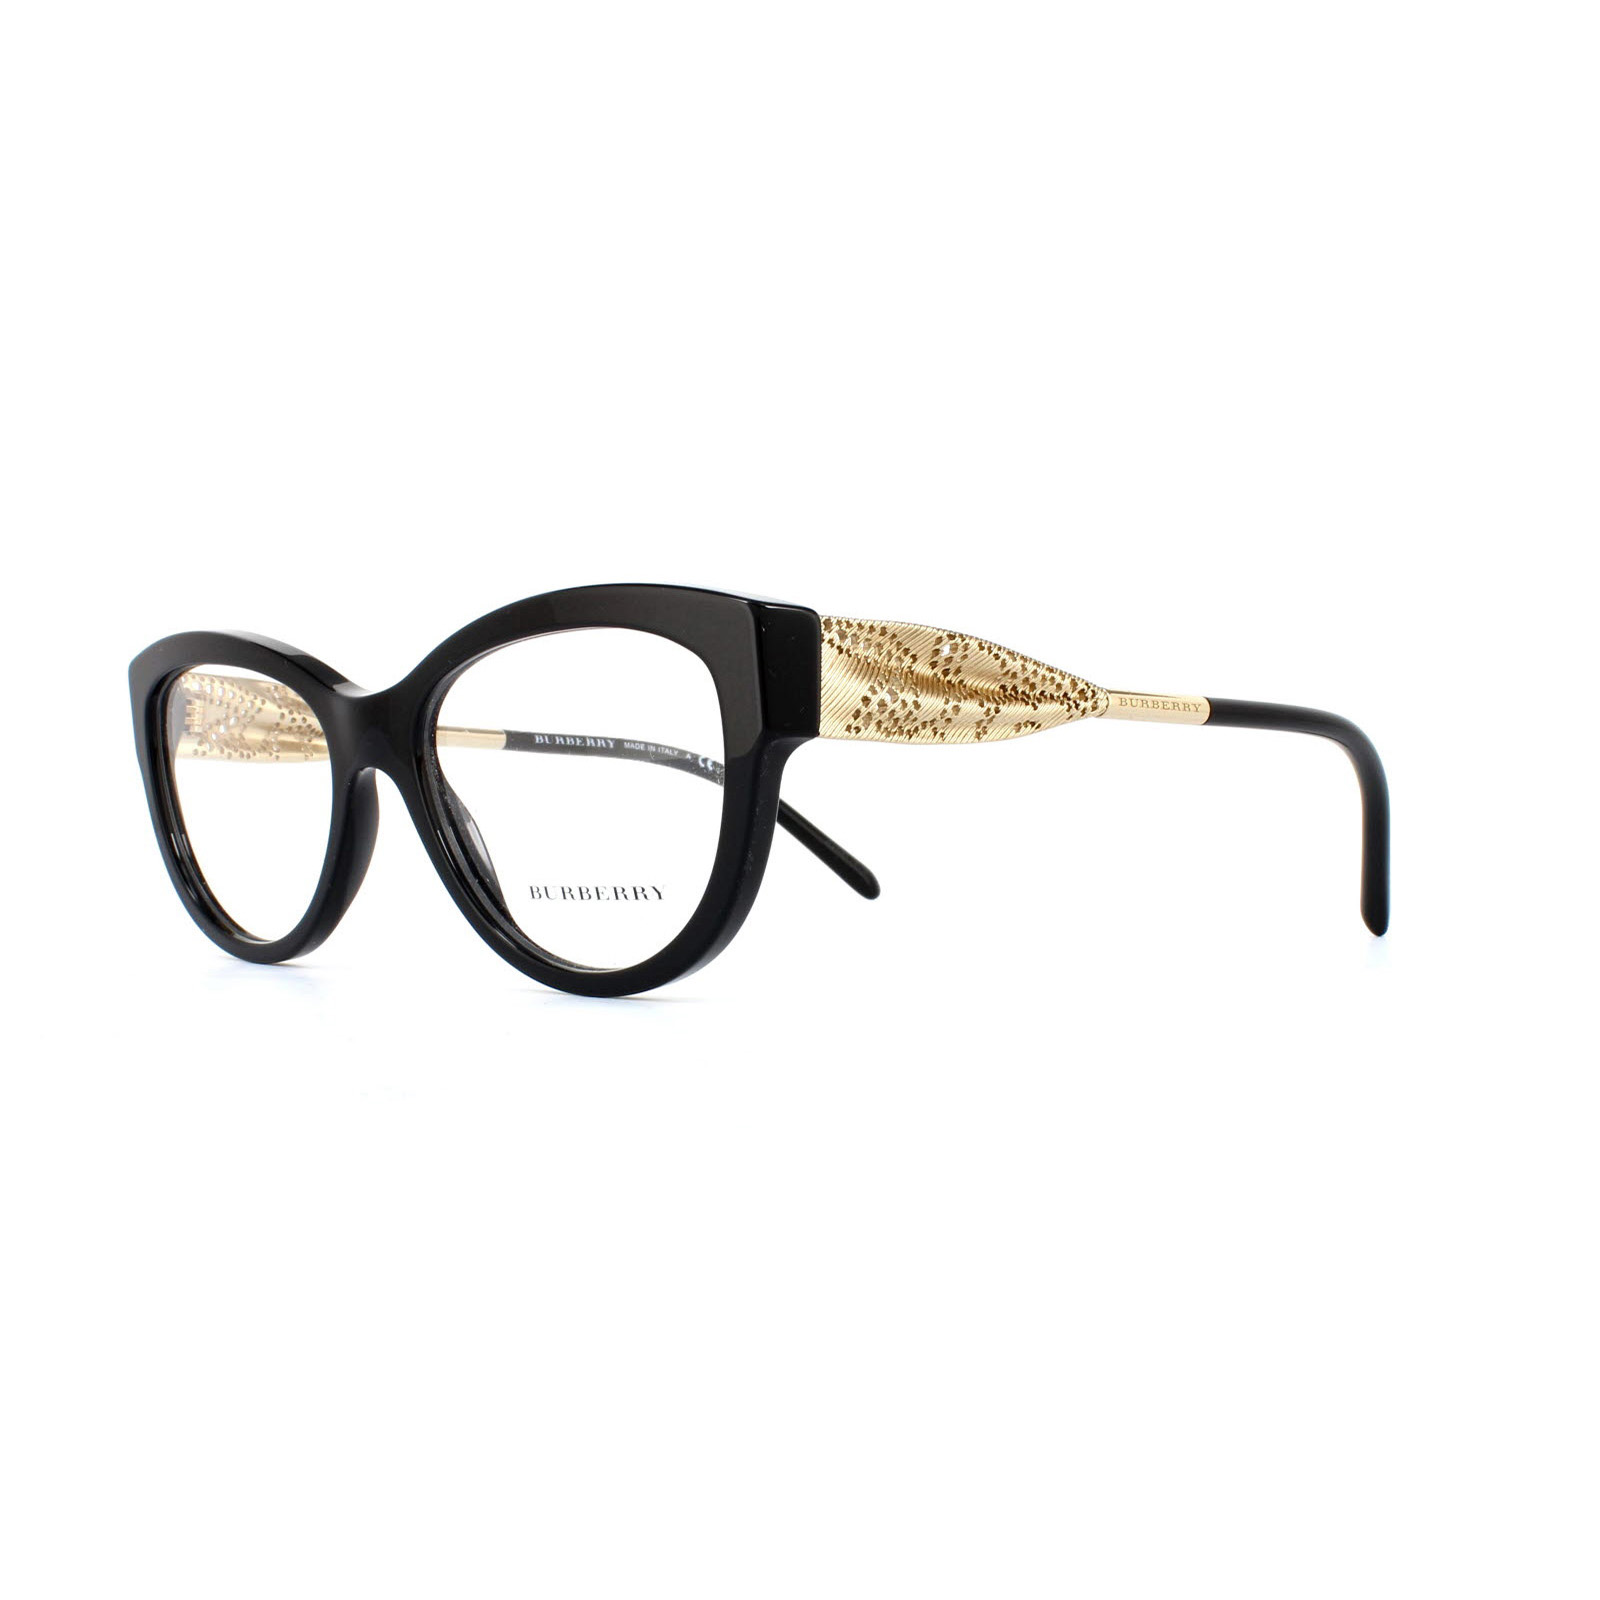 86da62c5c2 Sentinel Burberry Glasses Frames 2210 3001 Black Womens 53mm